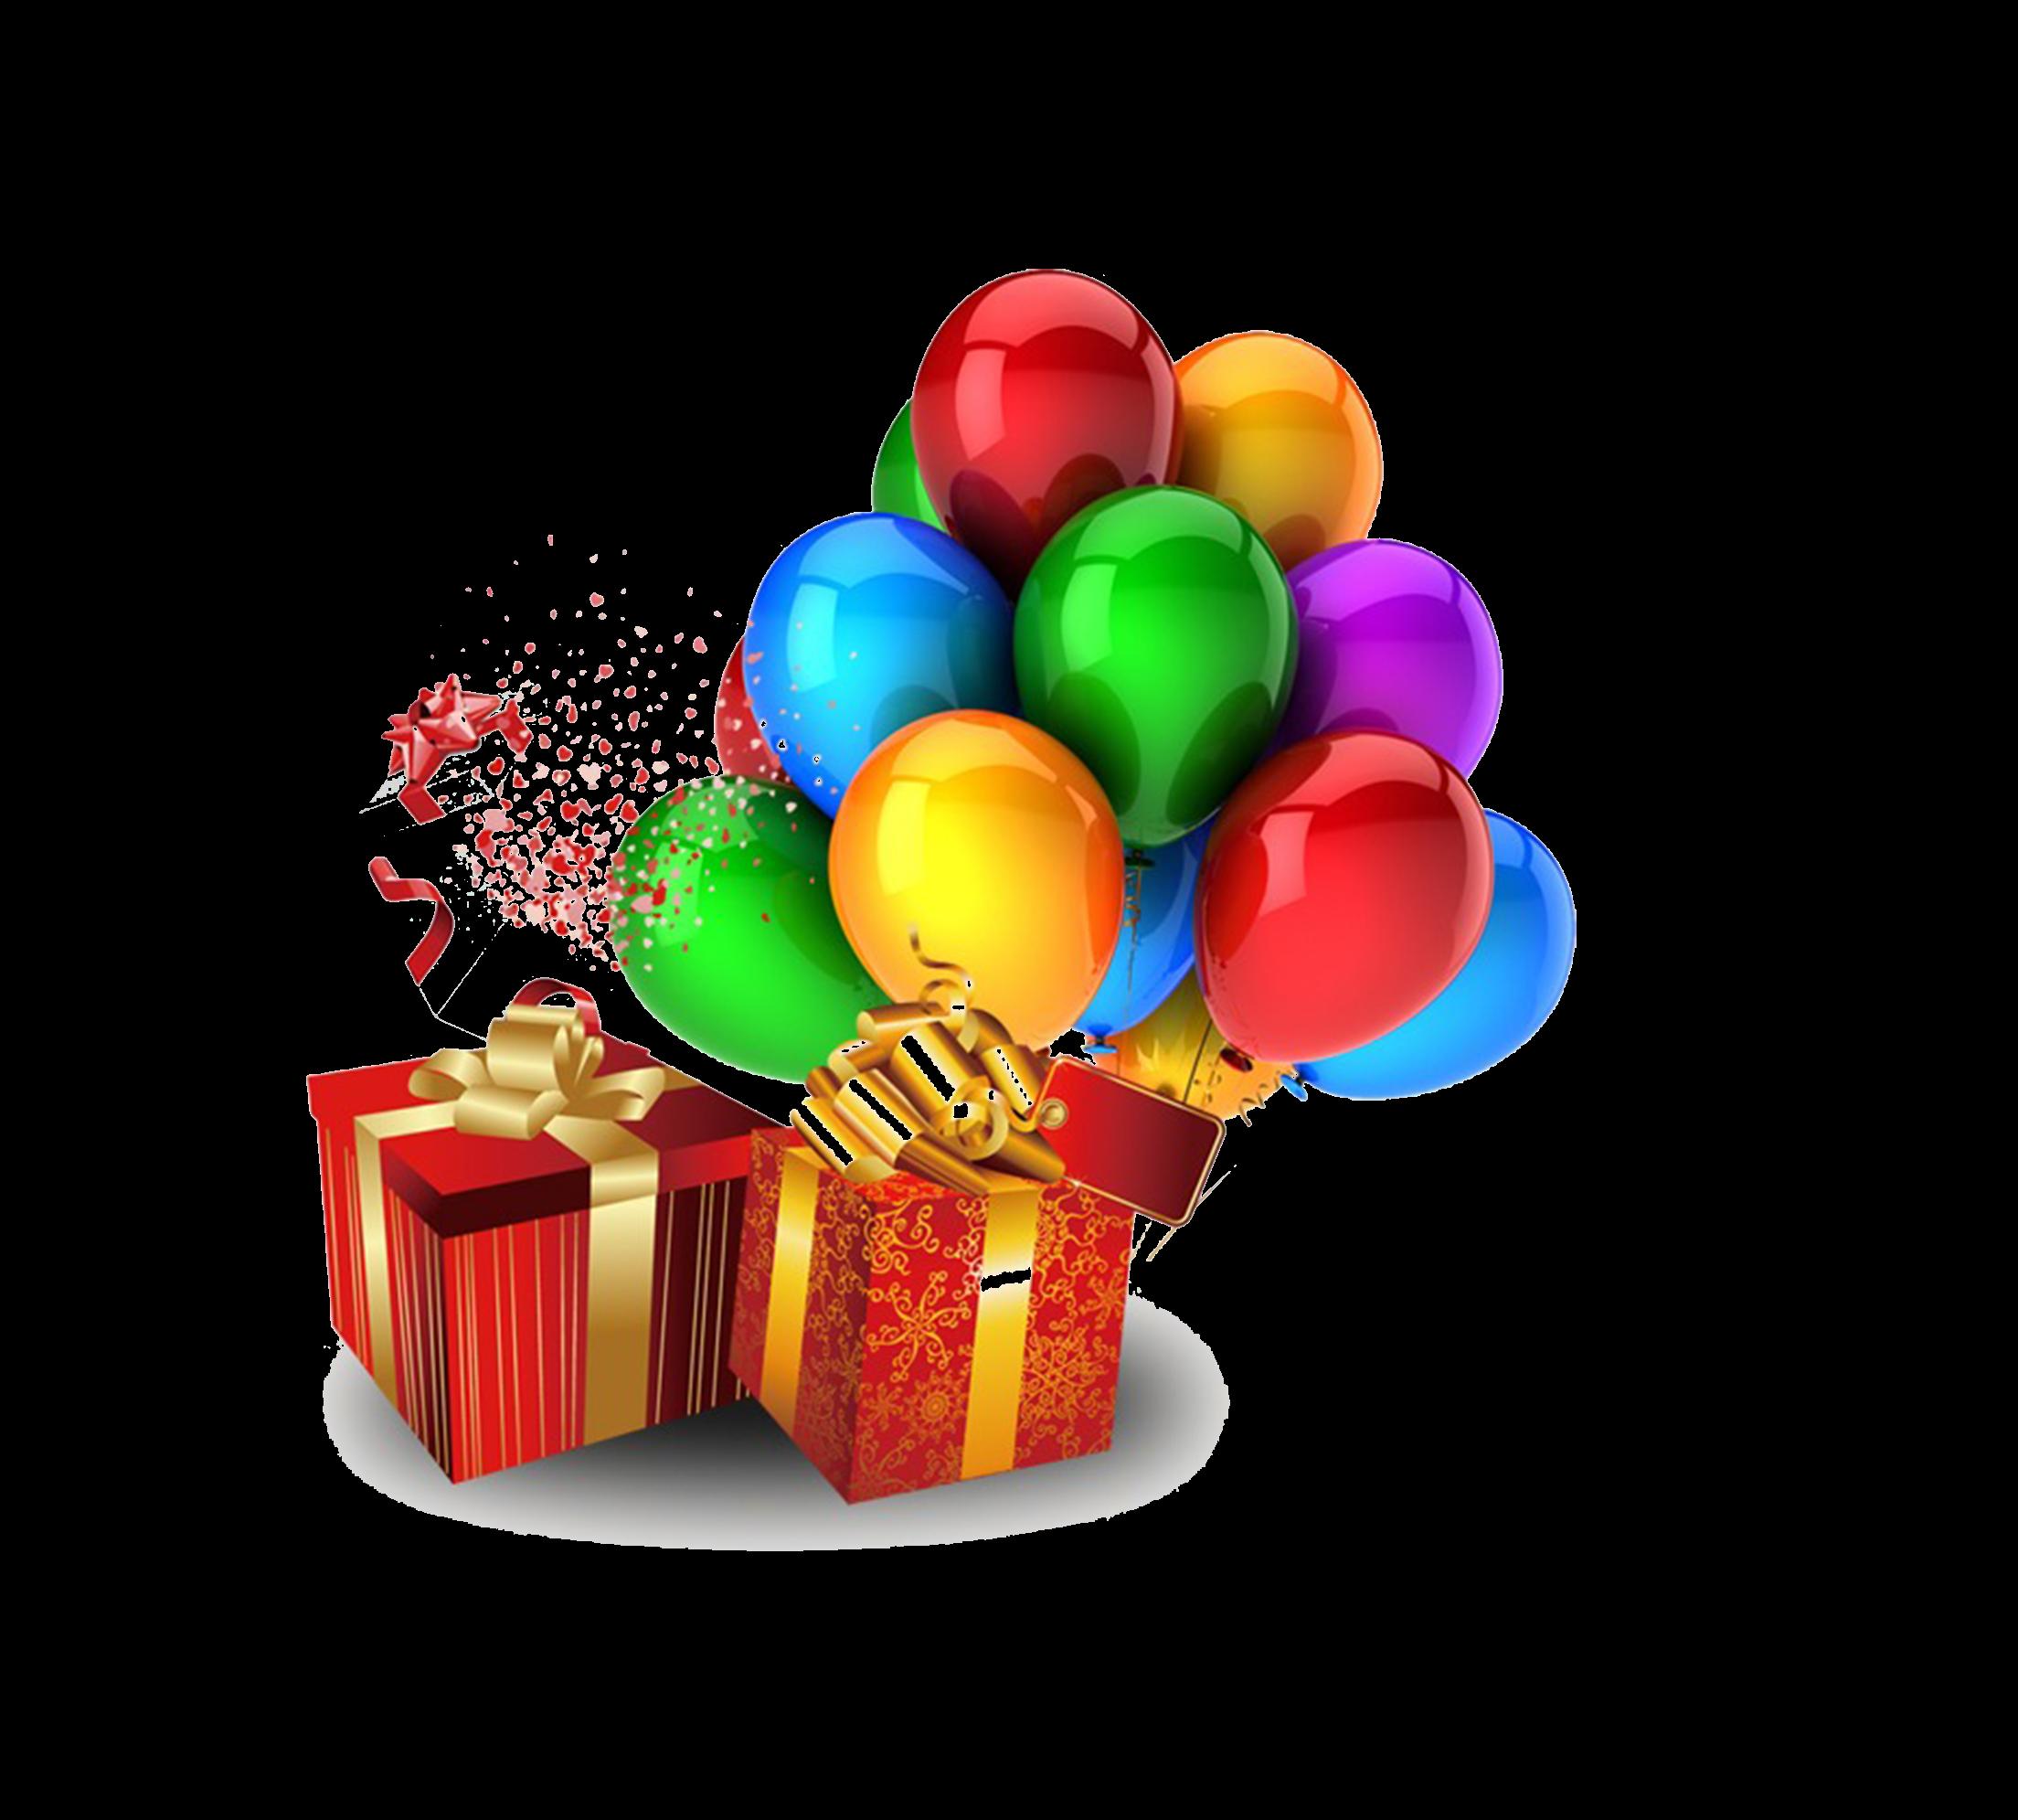 Clipart balloon presents. Birthday party clip art